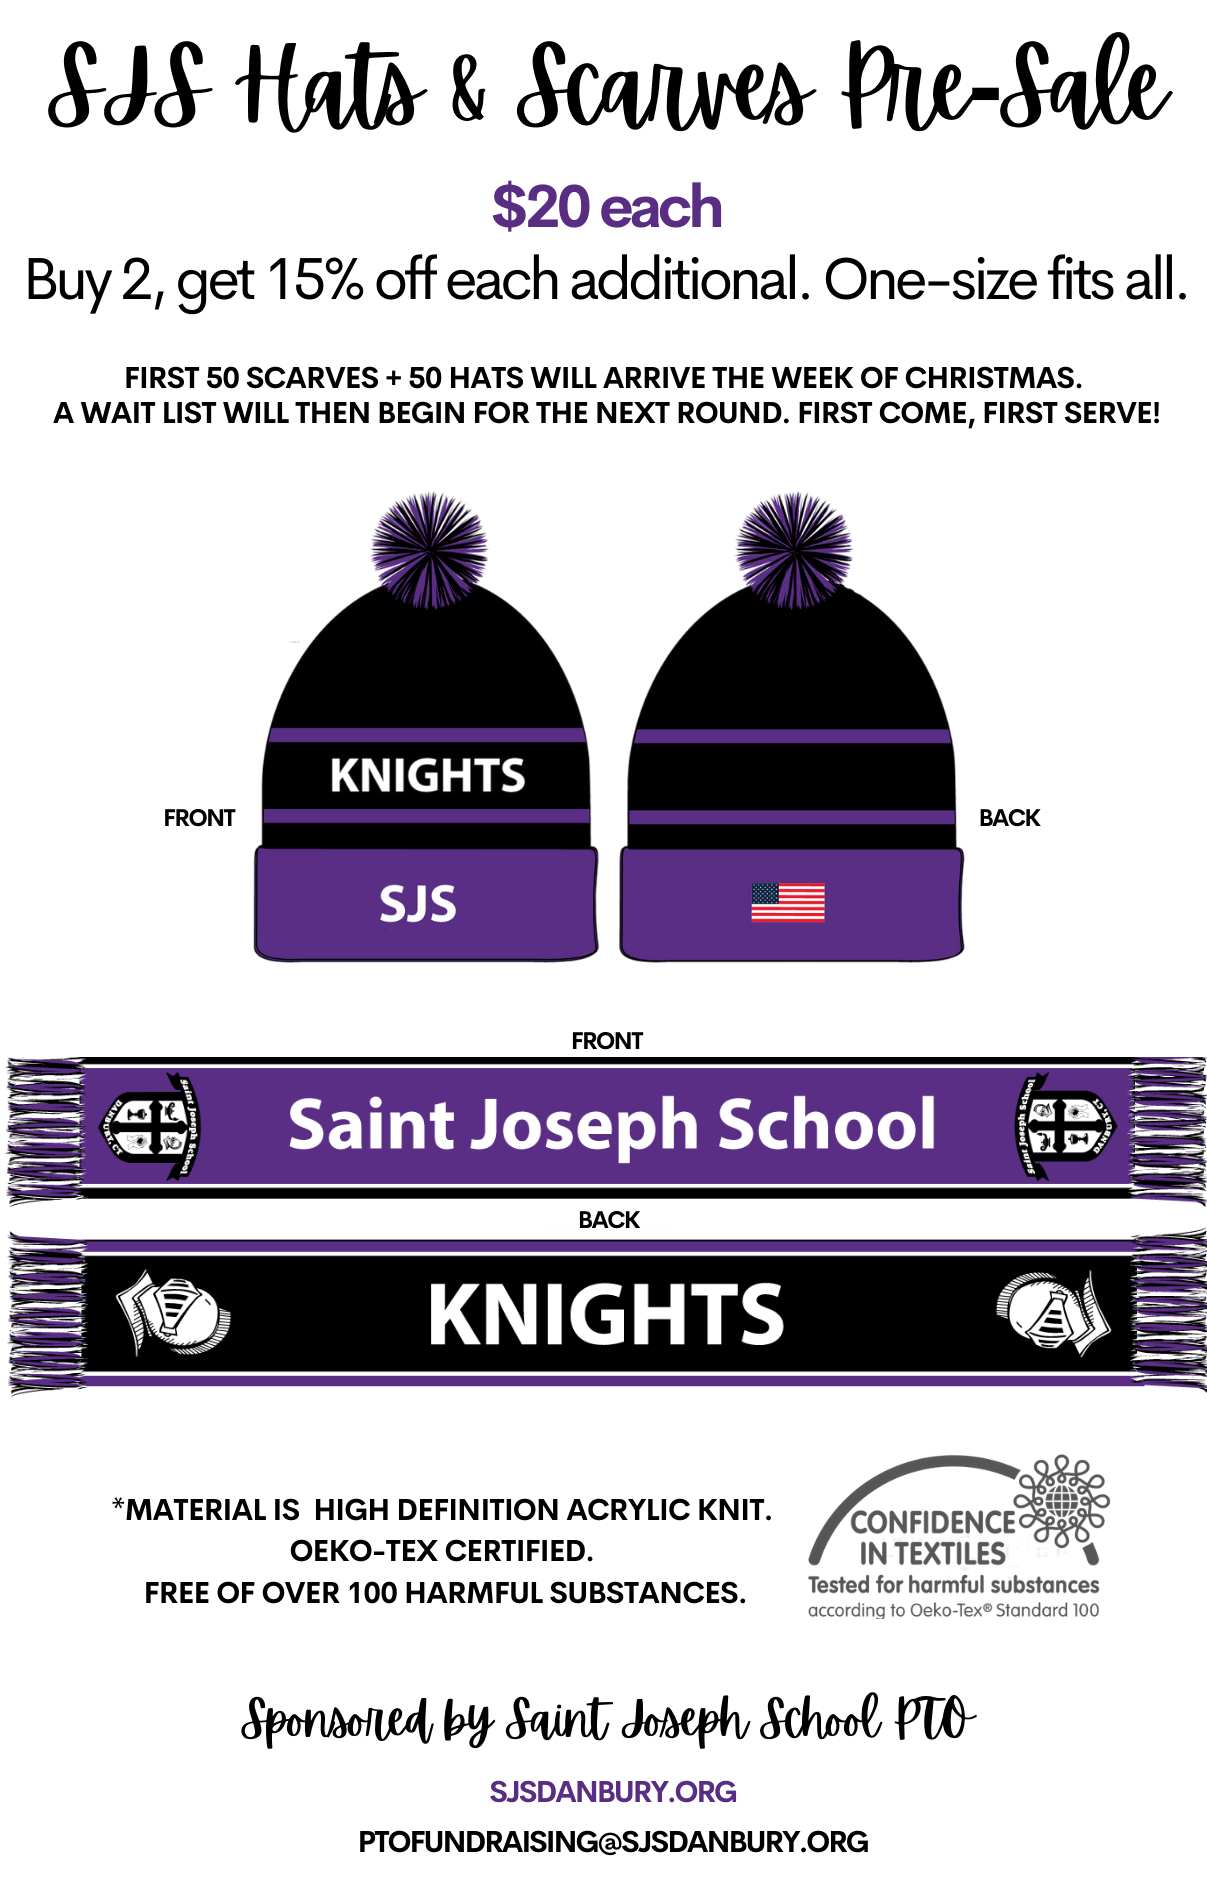 SJS Hats + Scarves